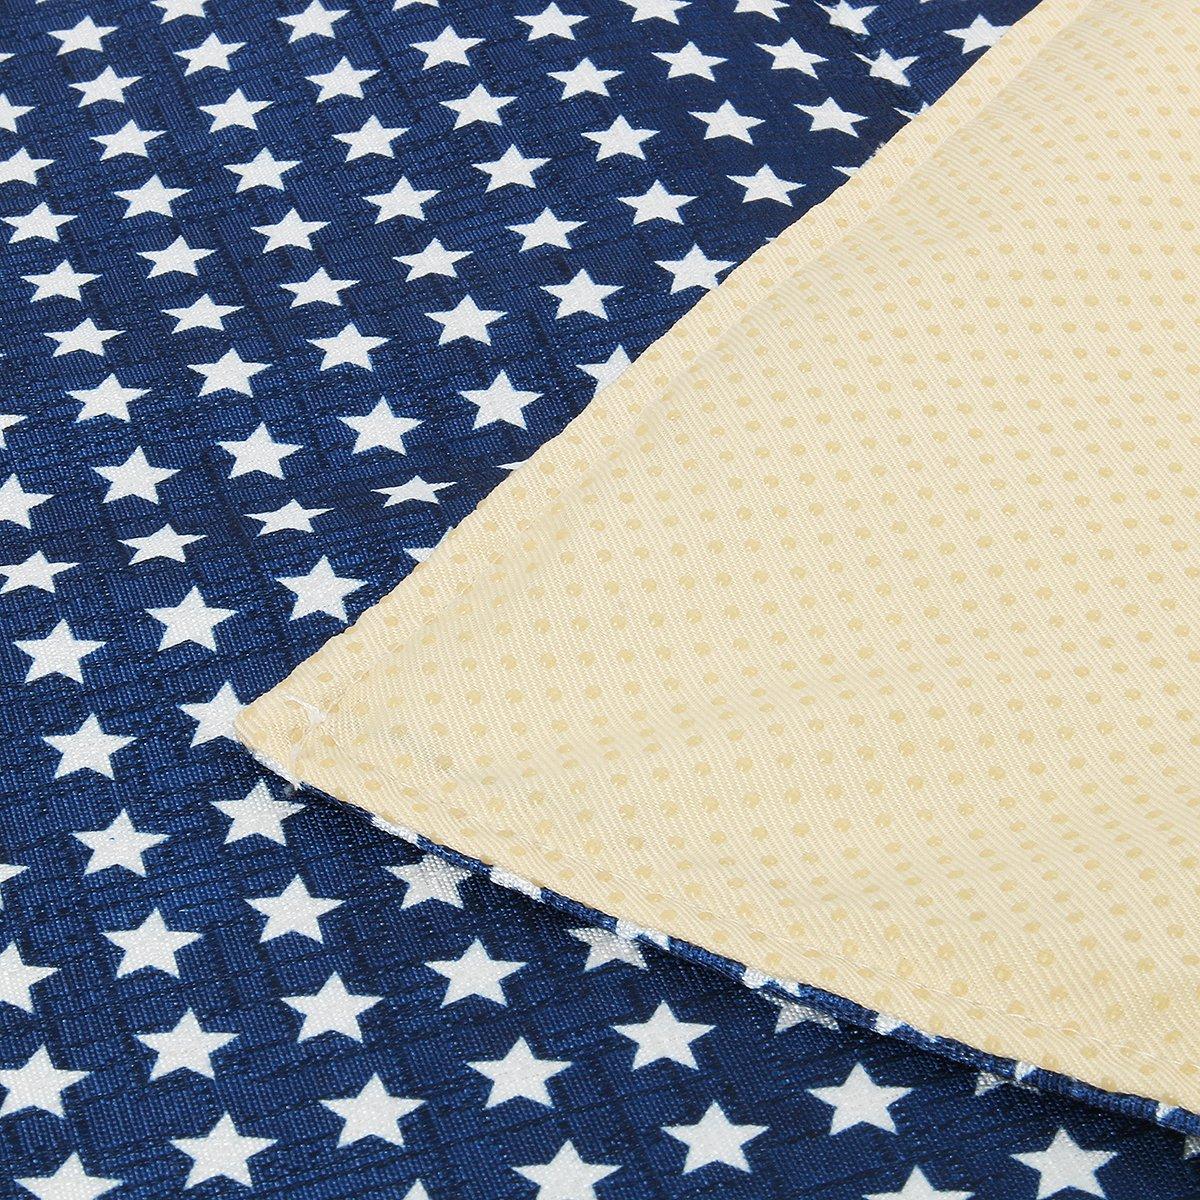 FunHoo Baby Splash Mat Under Highchair Anti Slip Feeding Floor Mat Protector 110 x 110 cm Grey